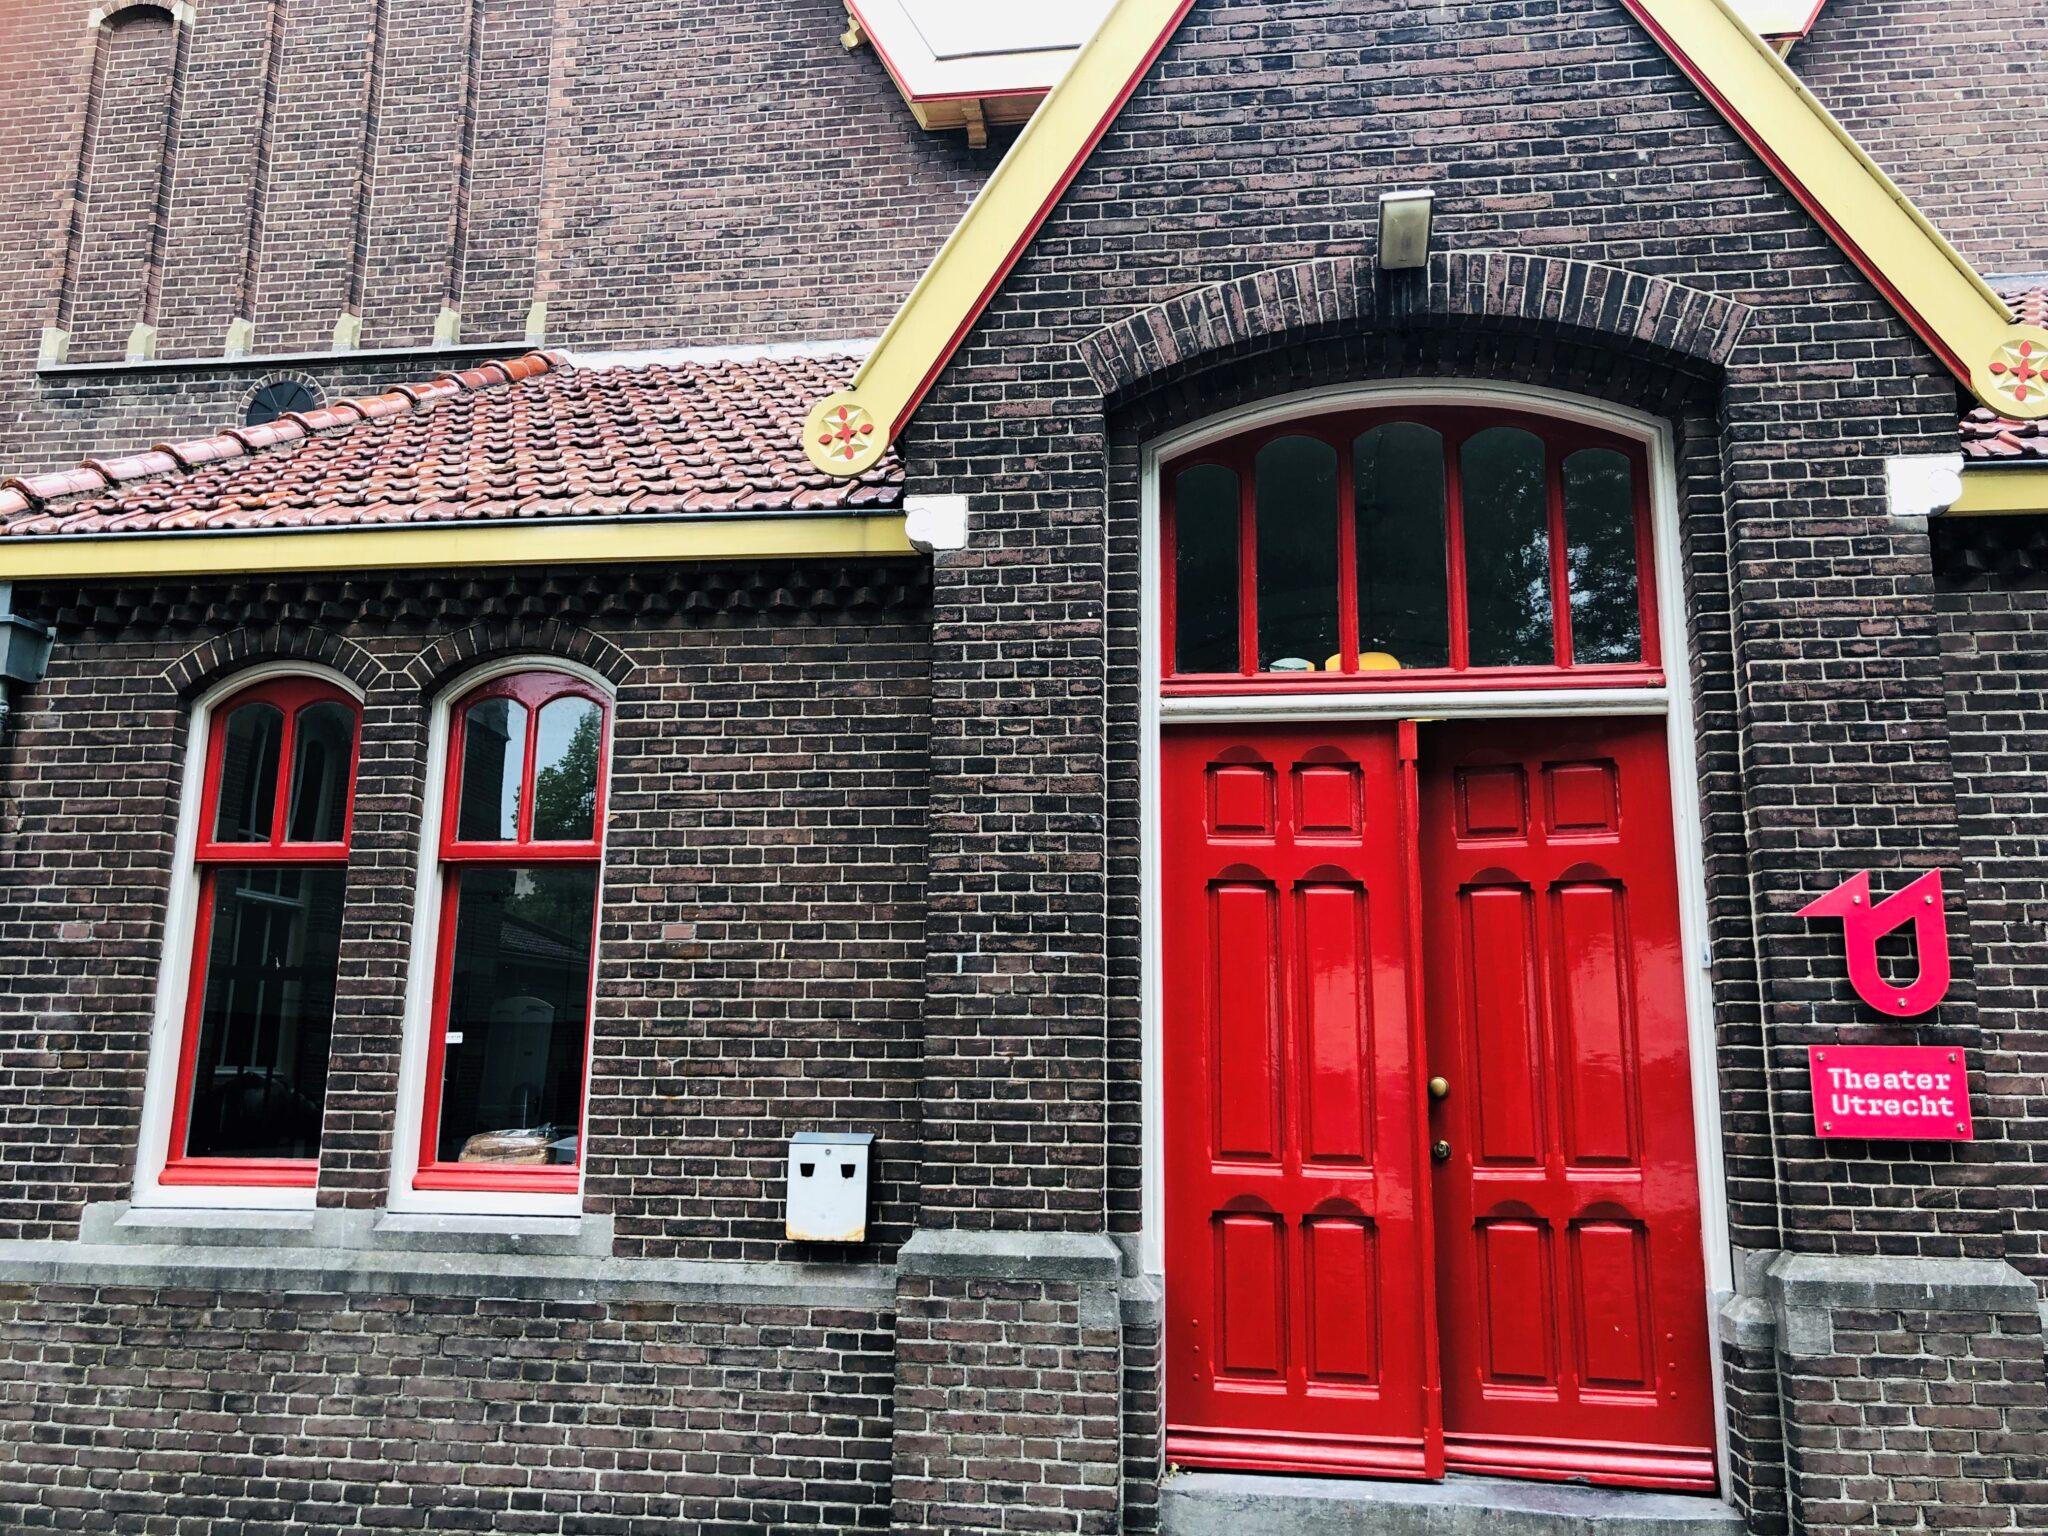 Theater Utrecht